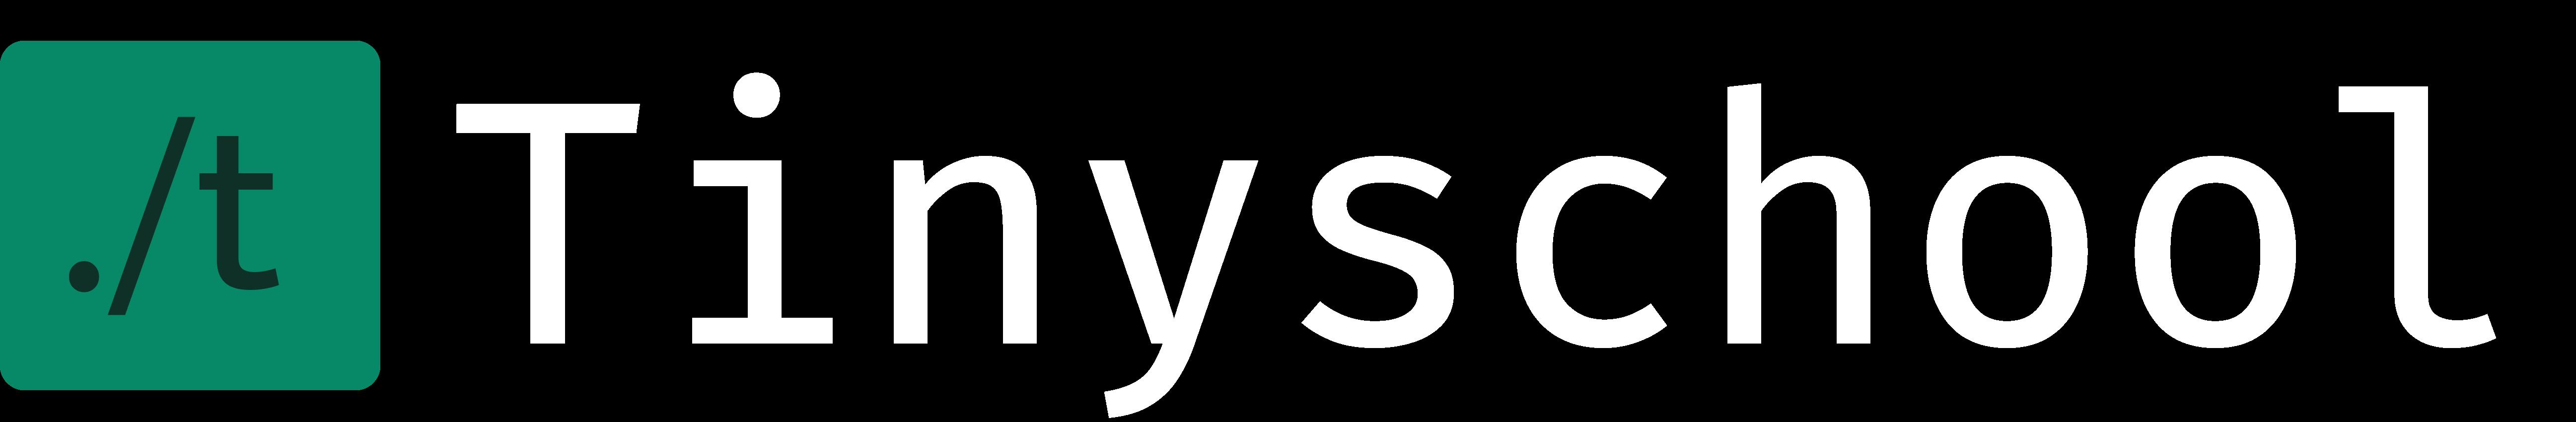 tiny-school-logo-with-text